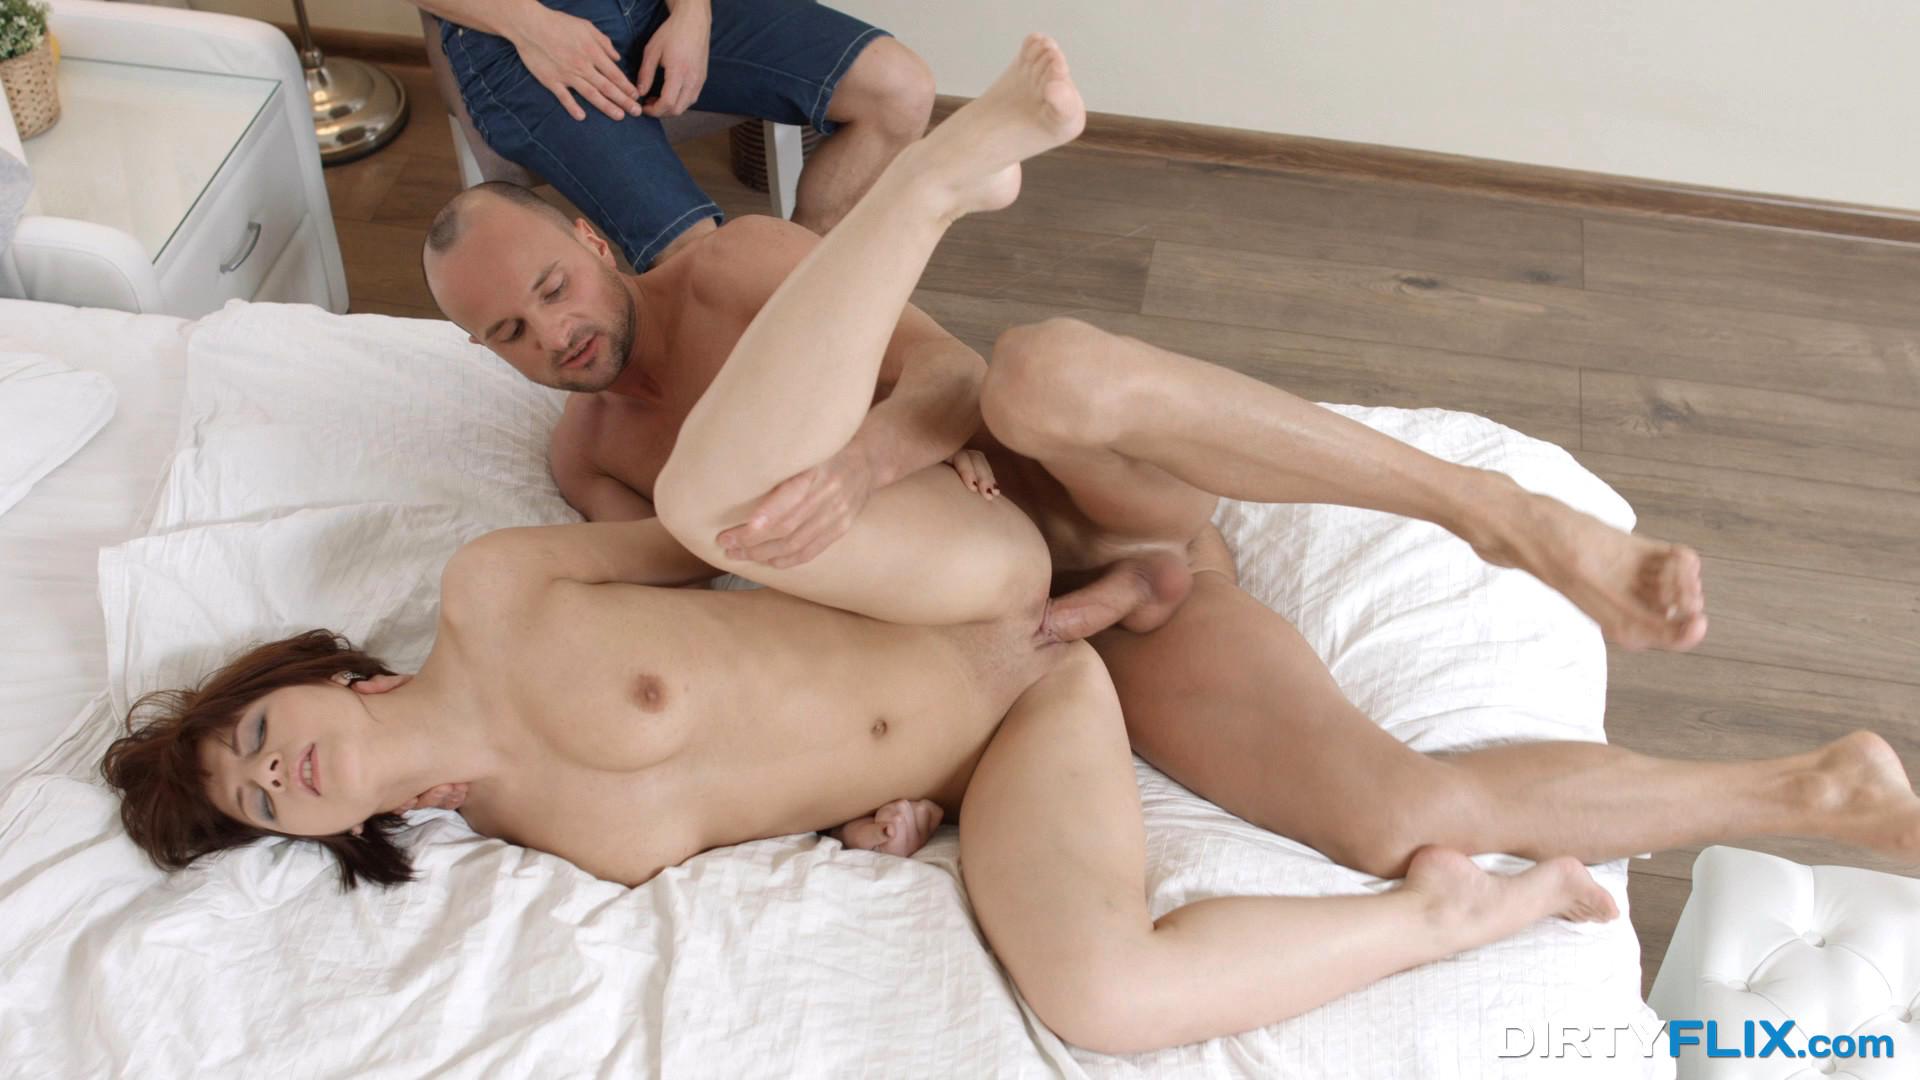 Flix porn video, blowjob for your husband